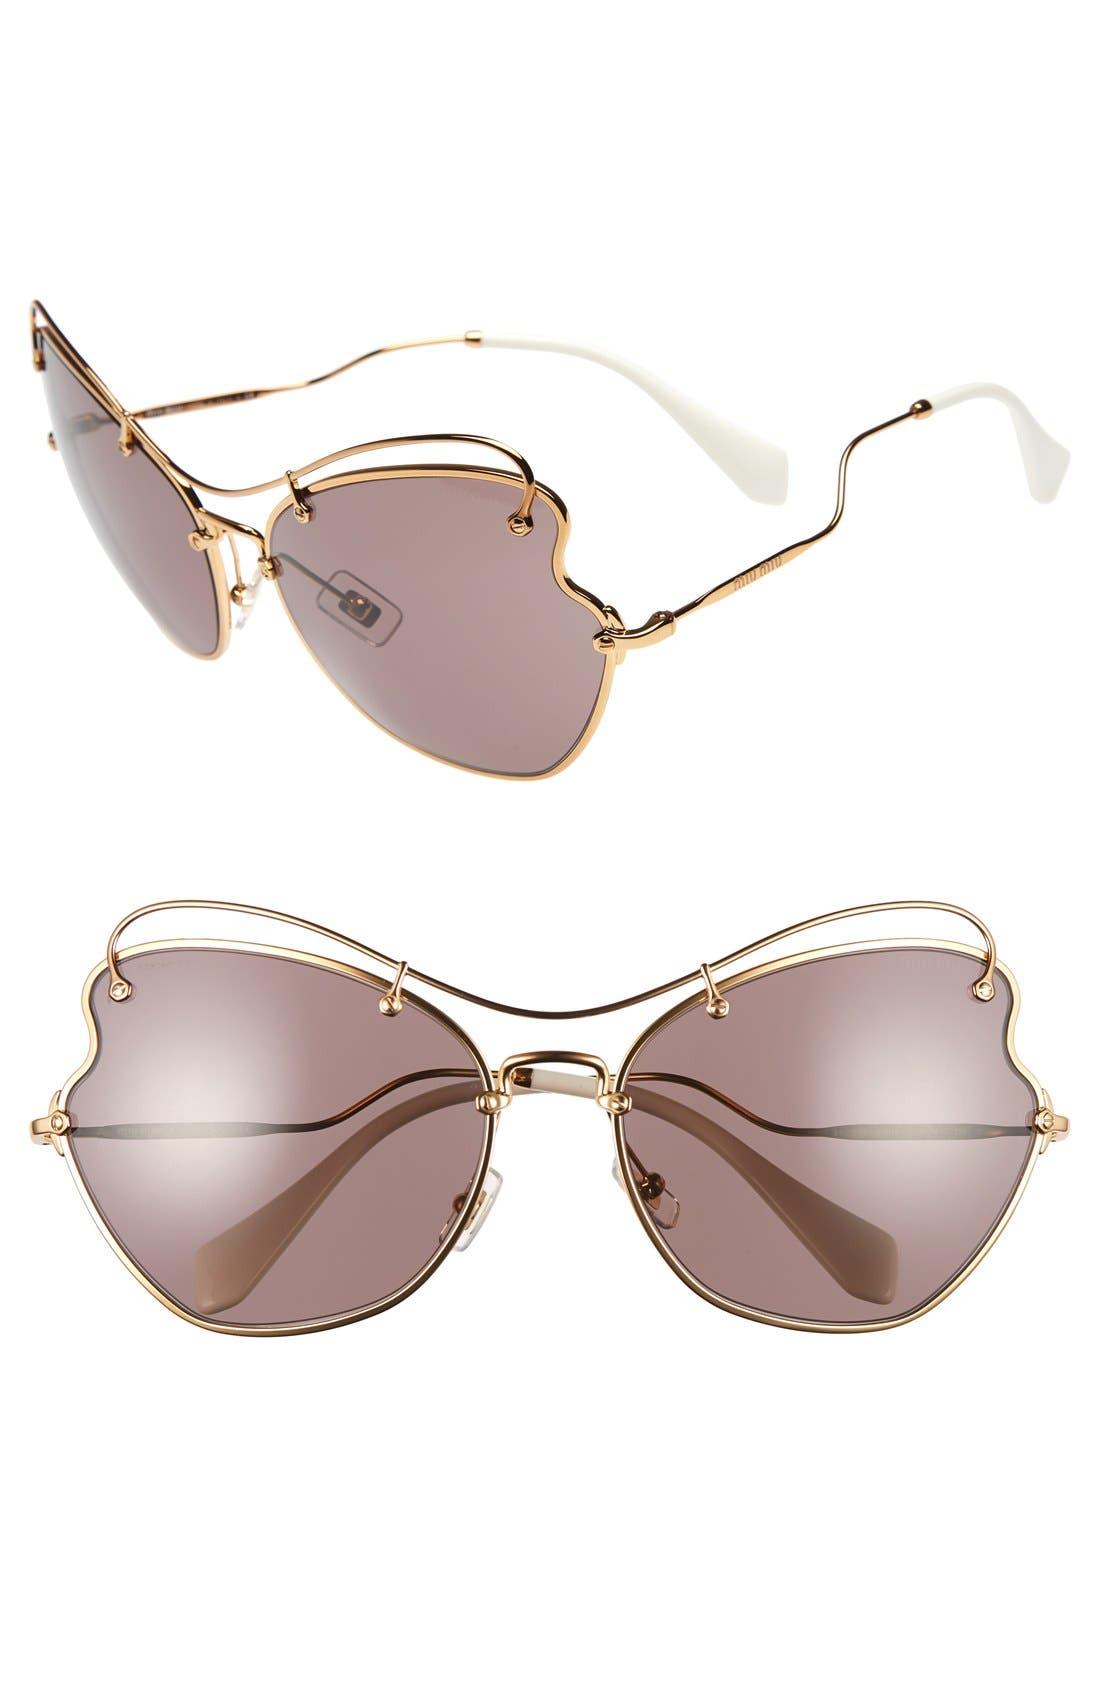 65mm Sunglasses,                             Main thumbnail 1, color,                             Light Purple